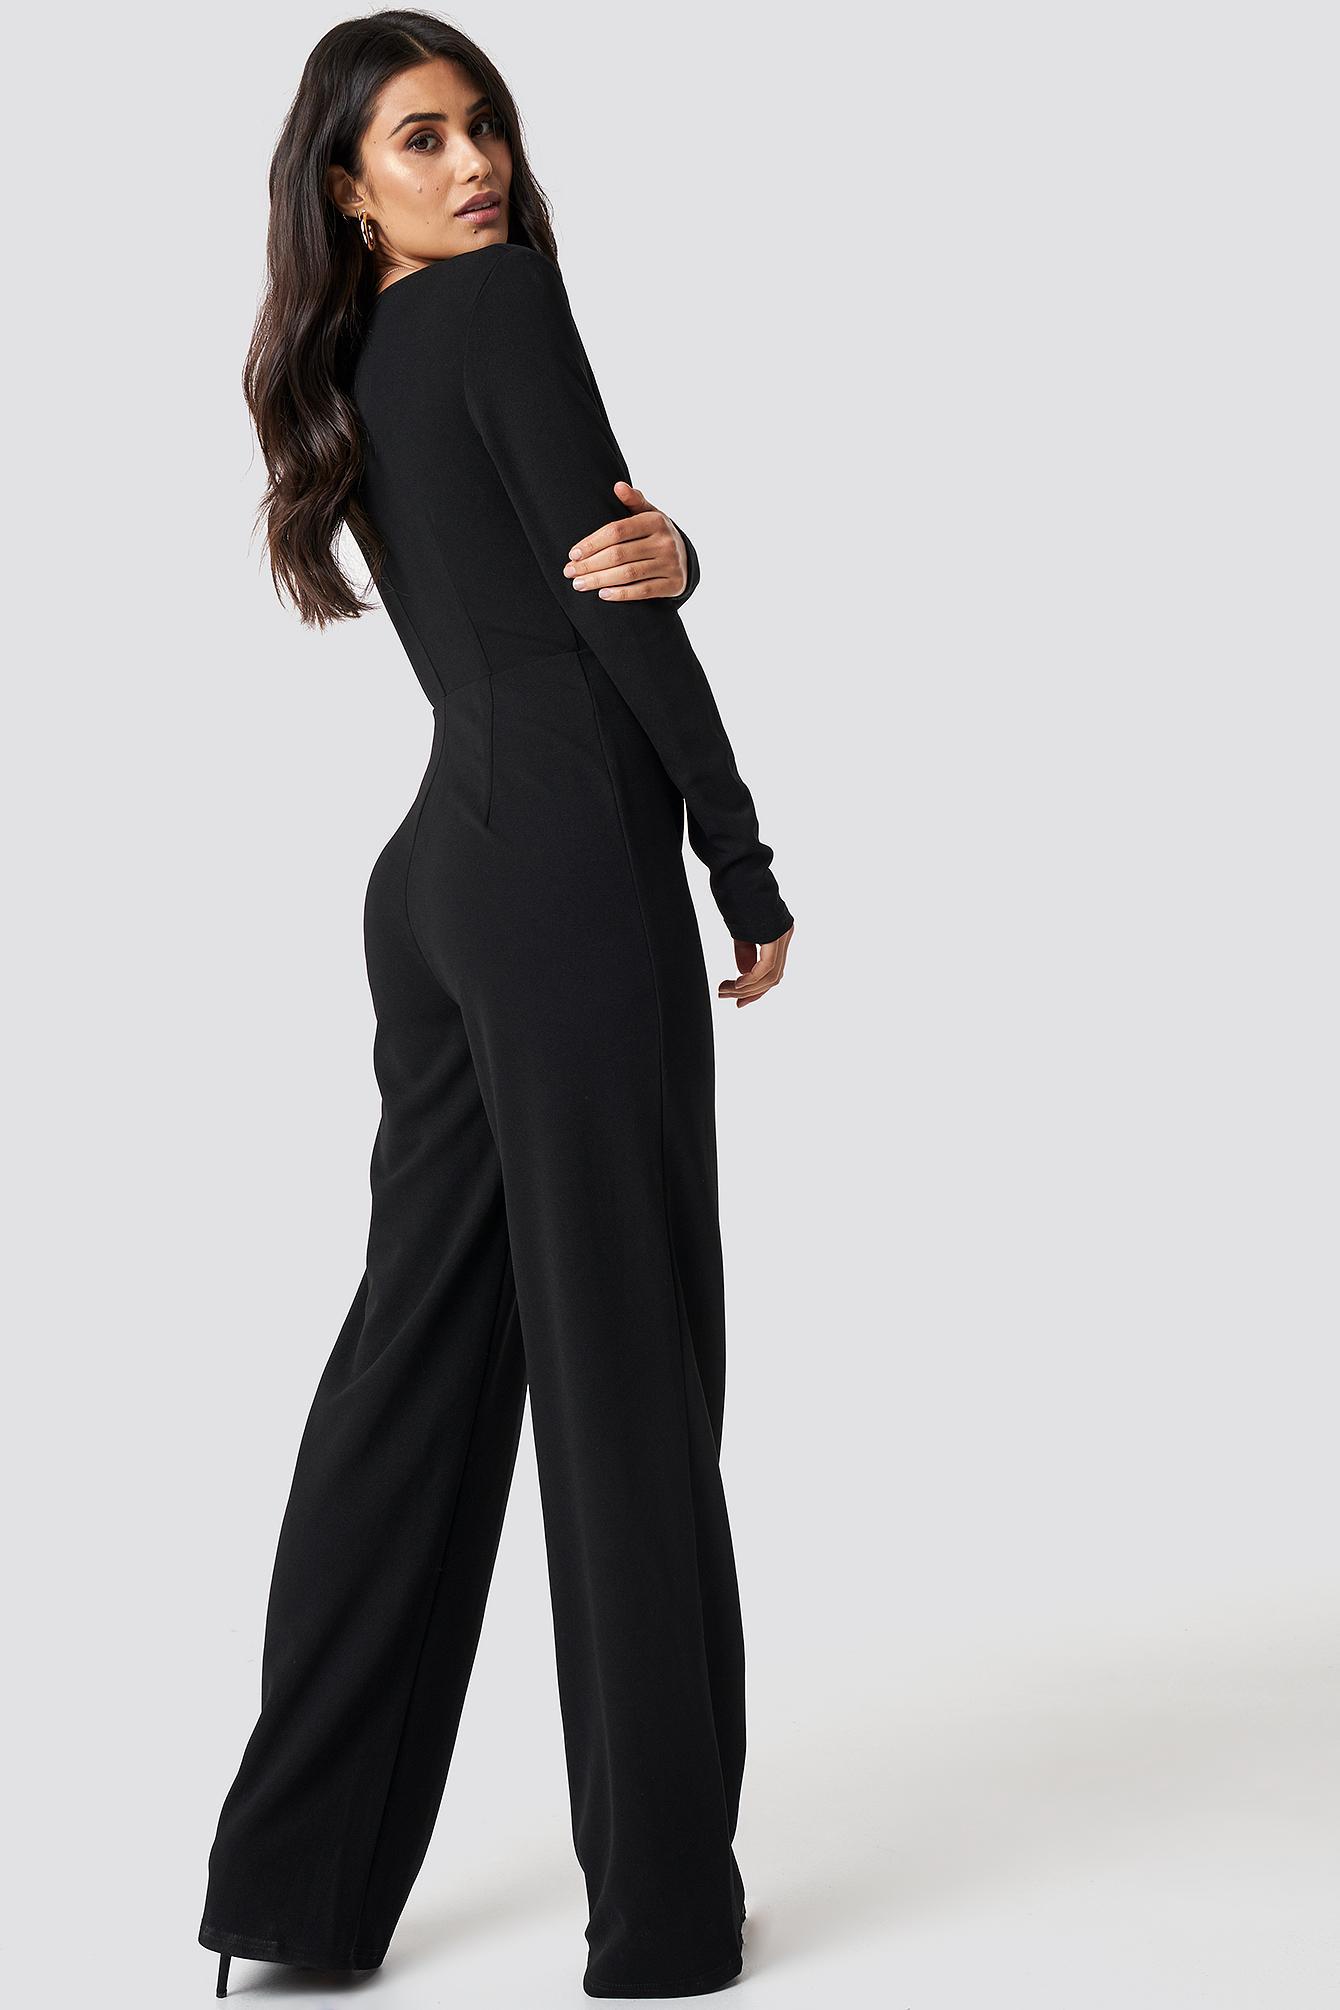 b9788e495193 Lyst - NA-KD Long Sleeve Wrap Front Jumpsuit Black in Black